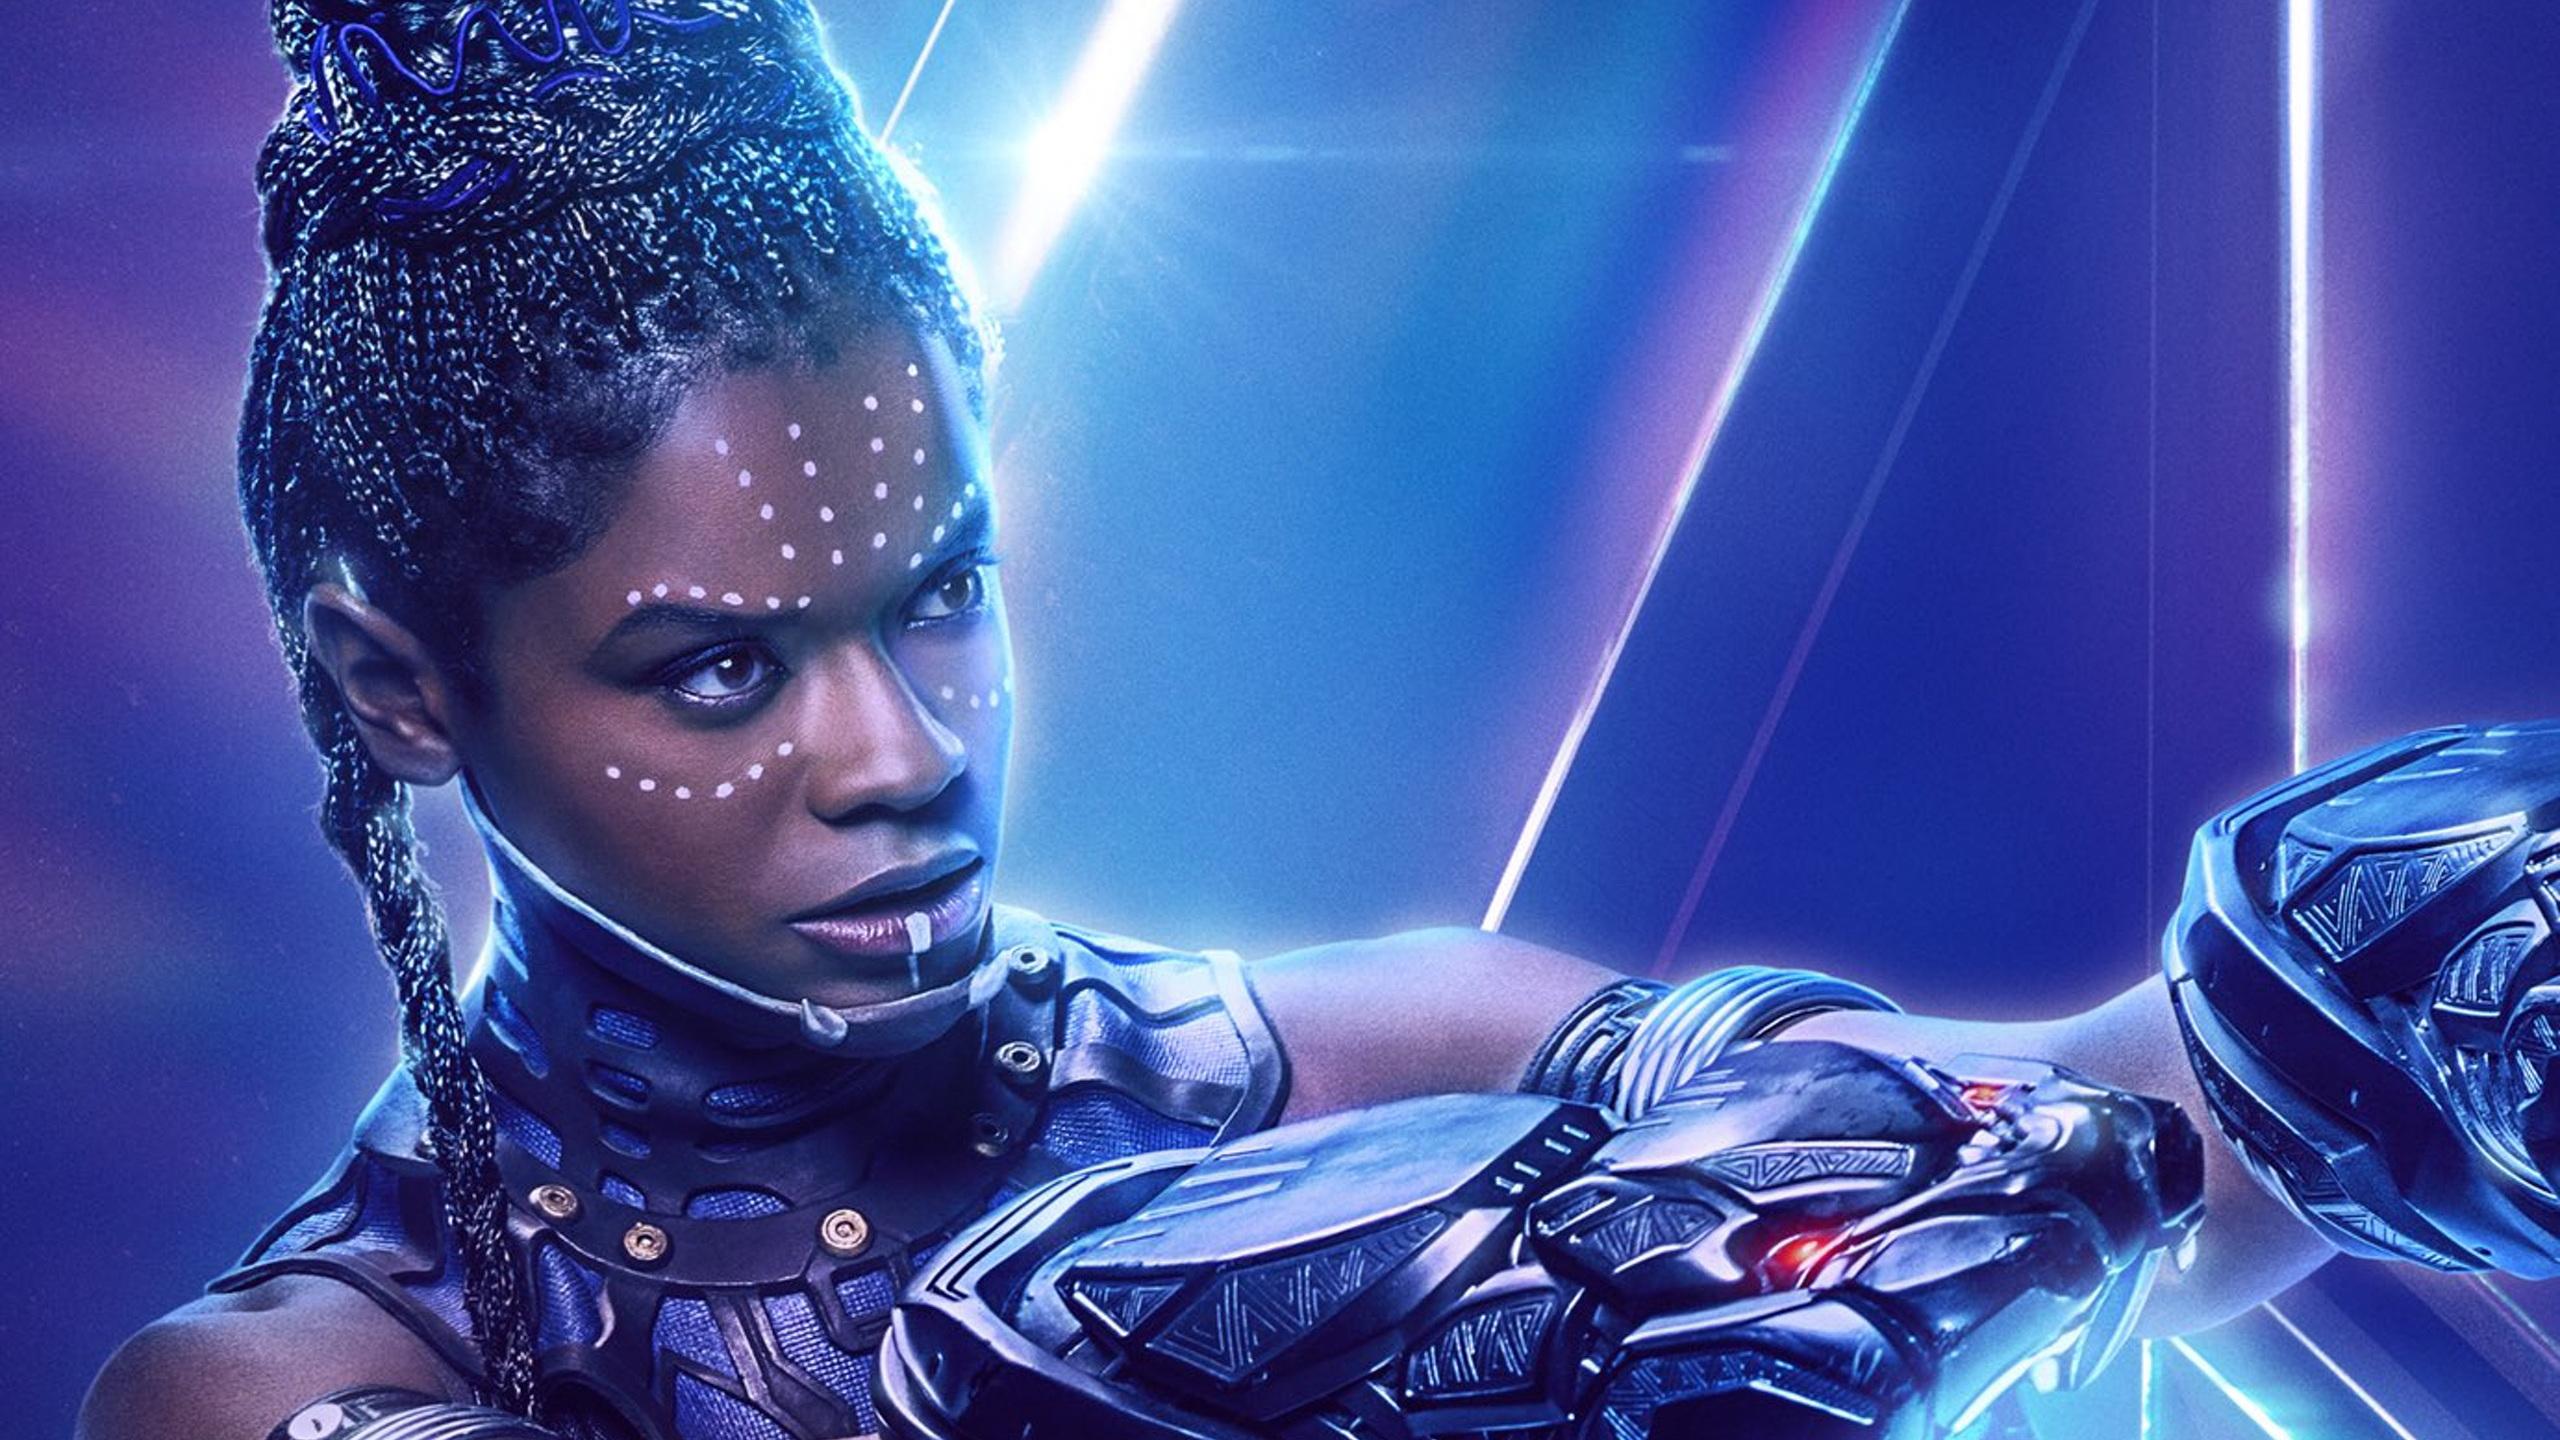 Shuri In Avengers Infinity War New Poster Hd Movies 4k: 2560x1440 Shuri In Avengers Infinity War New Poster 1440P